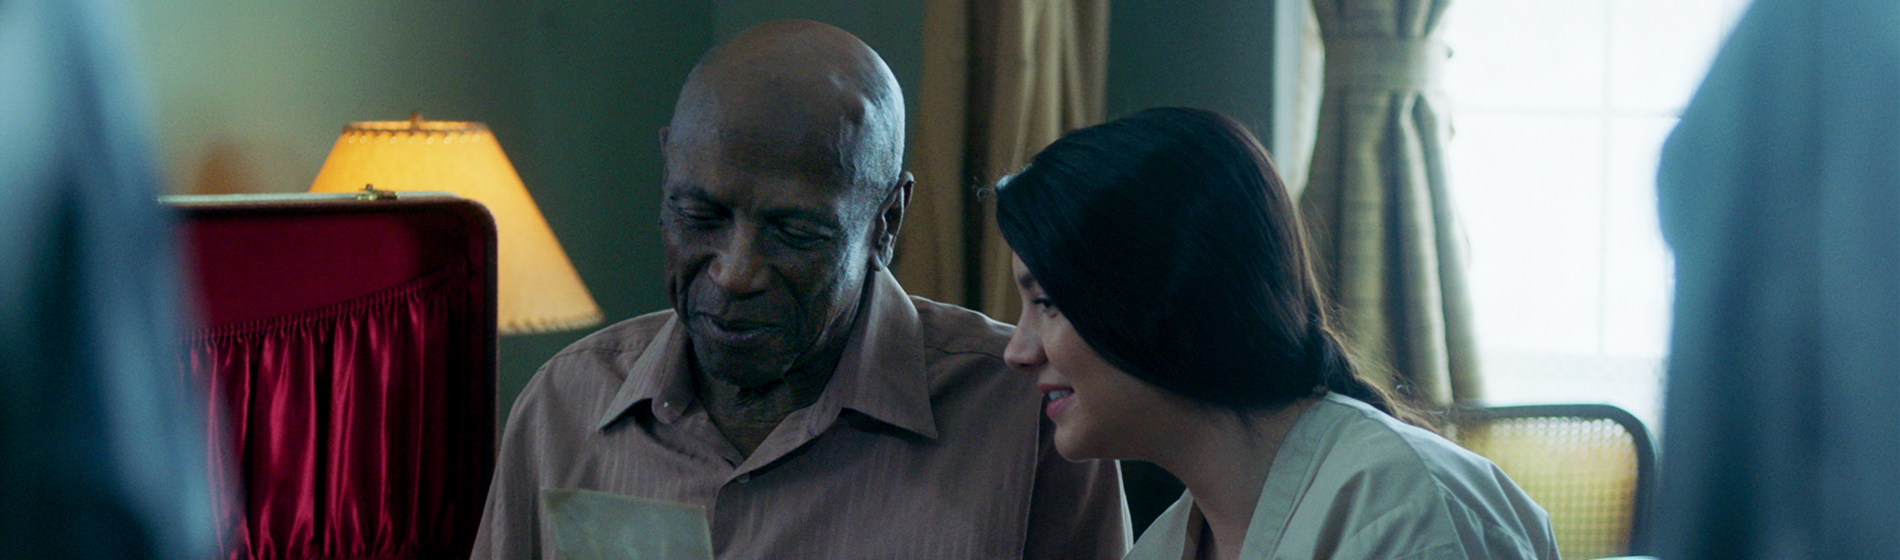 Louis Gossett Jr. and Ana Golja in The Cuban